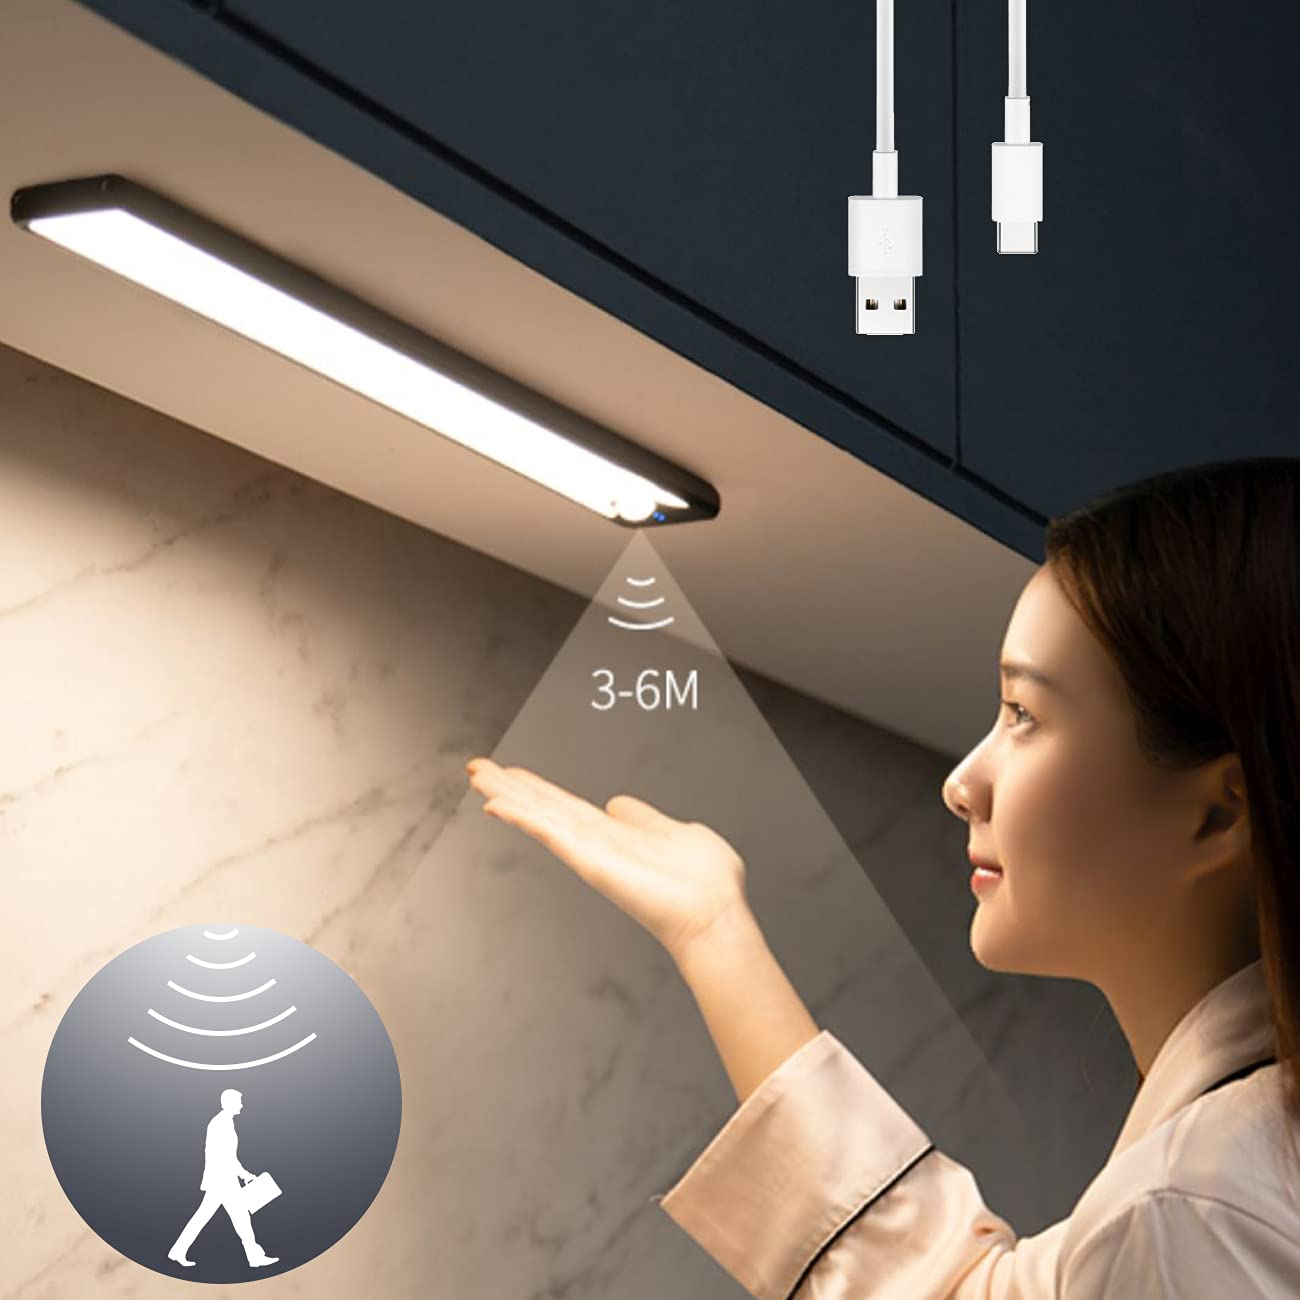 LEDセンサーライト USB充電式 2200mAh 大容量電池 超薄型設計 昼光色 4500K 40cm 無段階調光 階段ライト 足元灯 省エネ 自動点灯 120°感知範囲 3-5メートル距離 配線不要 防災 廊下 玄関 キッチン 室内照明 高感度 高輝度 超寿命; セール価格: ¥2,499